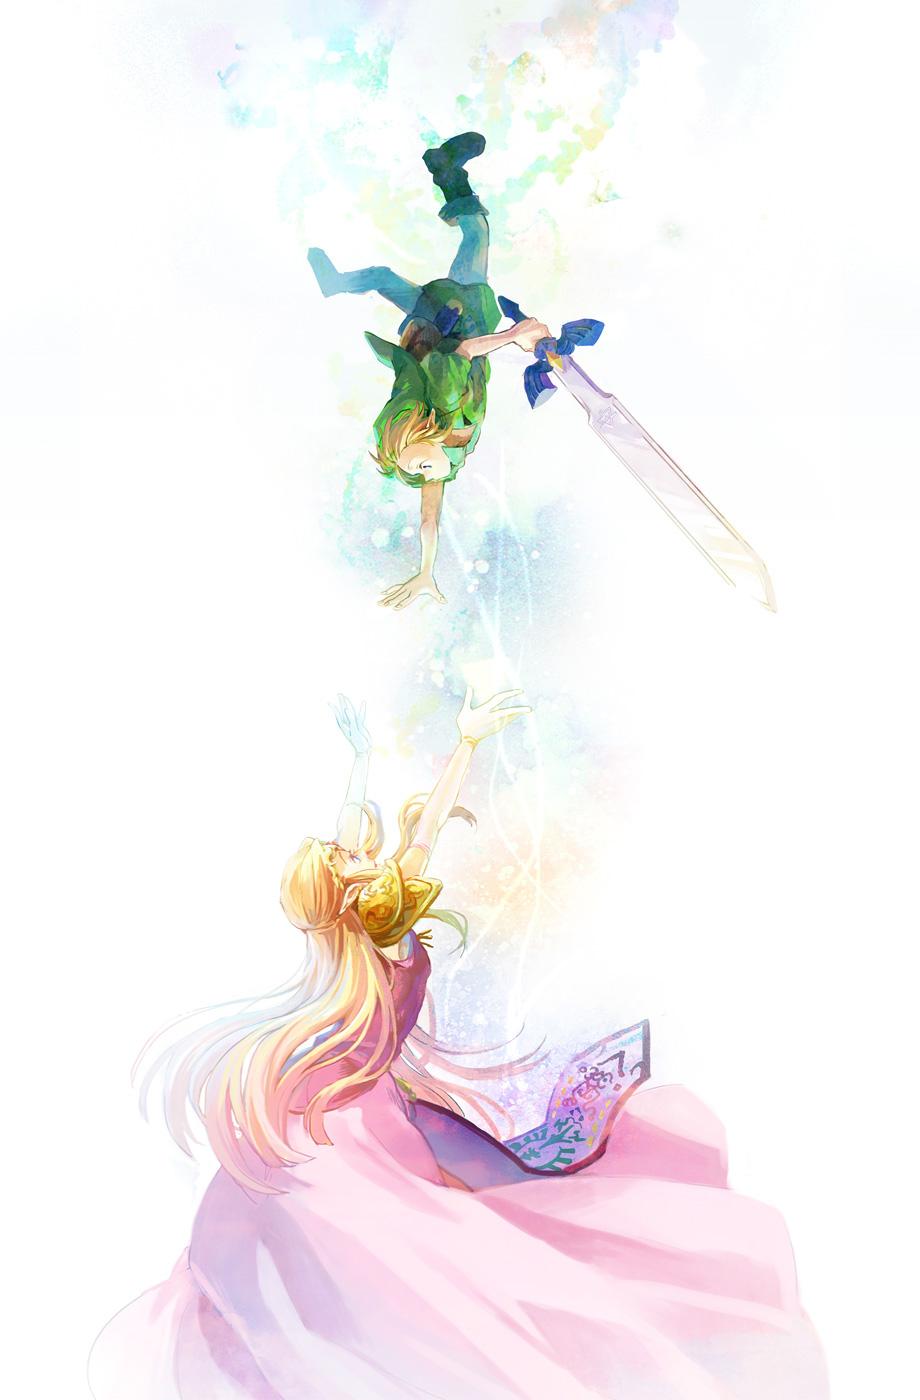 Ocarina of Time · download Ocarina of Time image